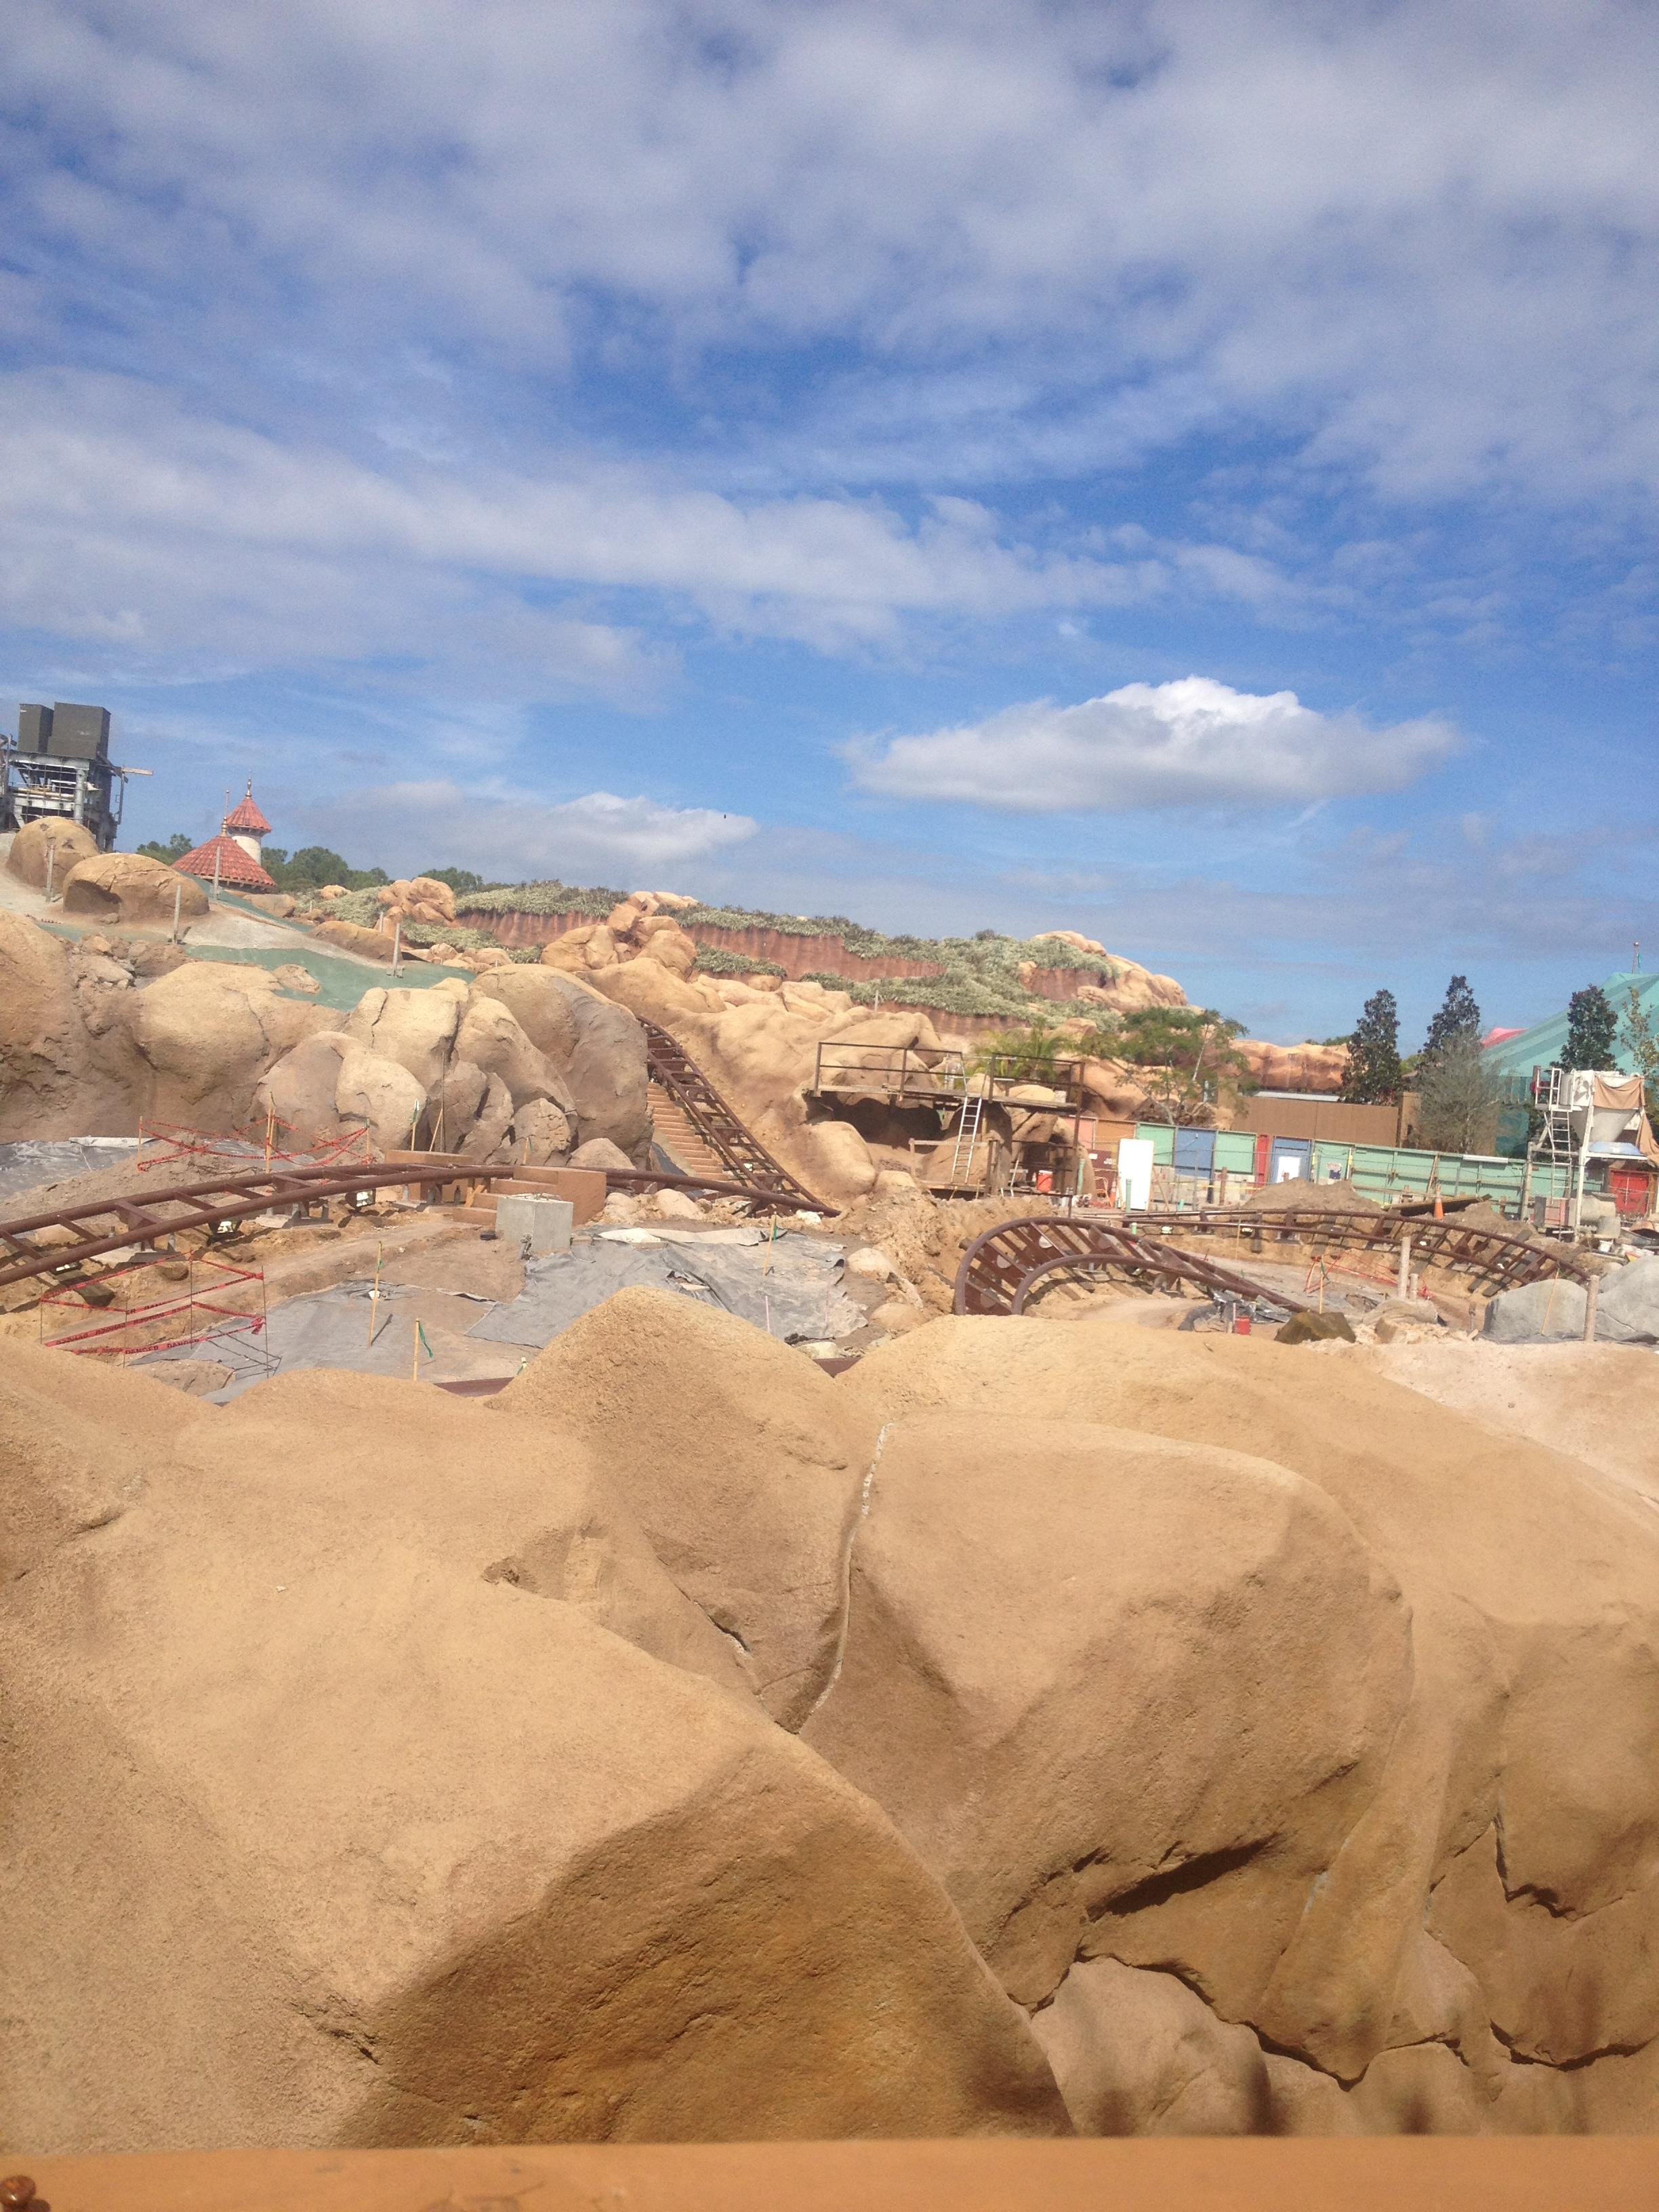 Seven Dwarfs Mine Train construction - Photo by Jon